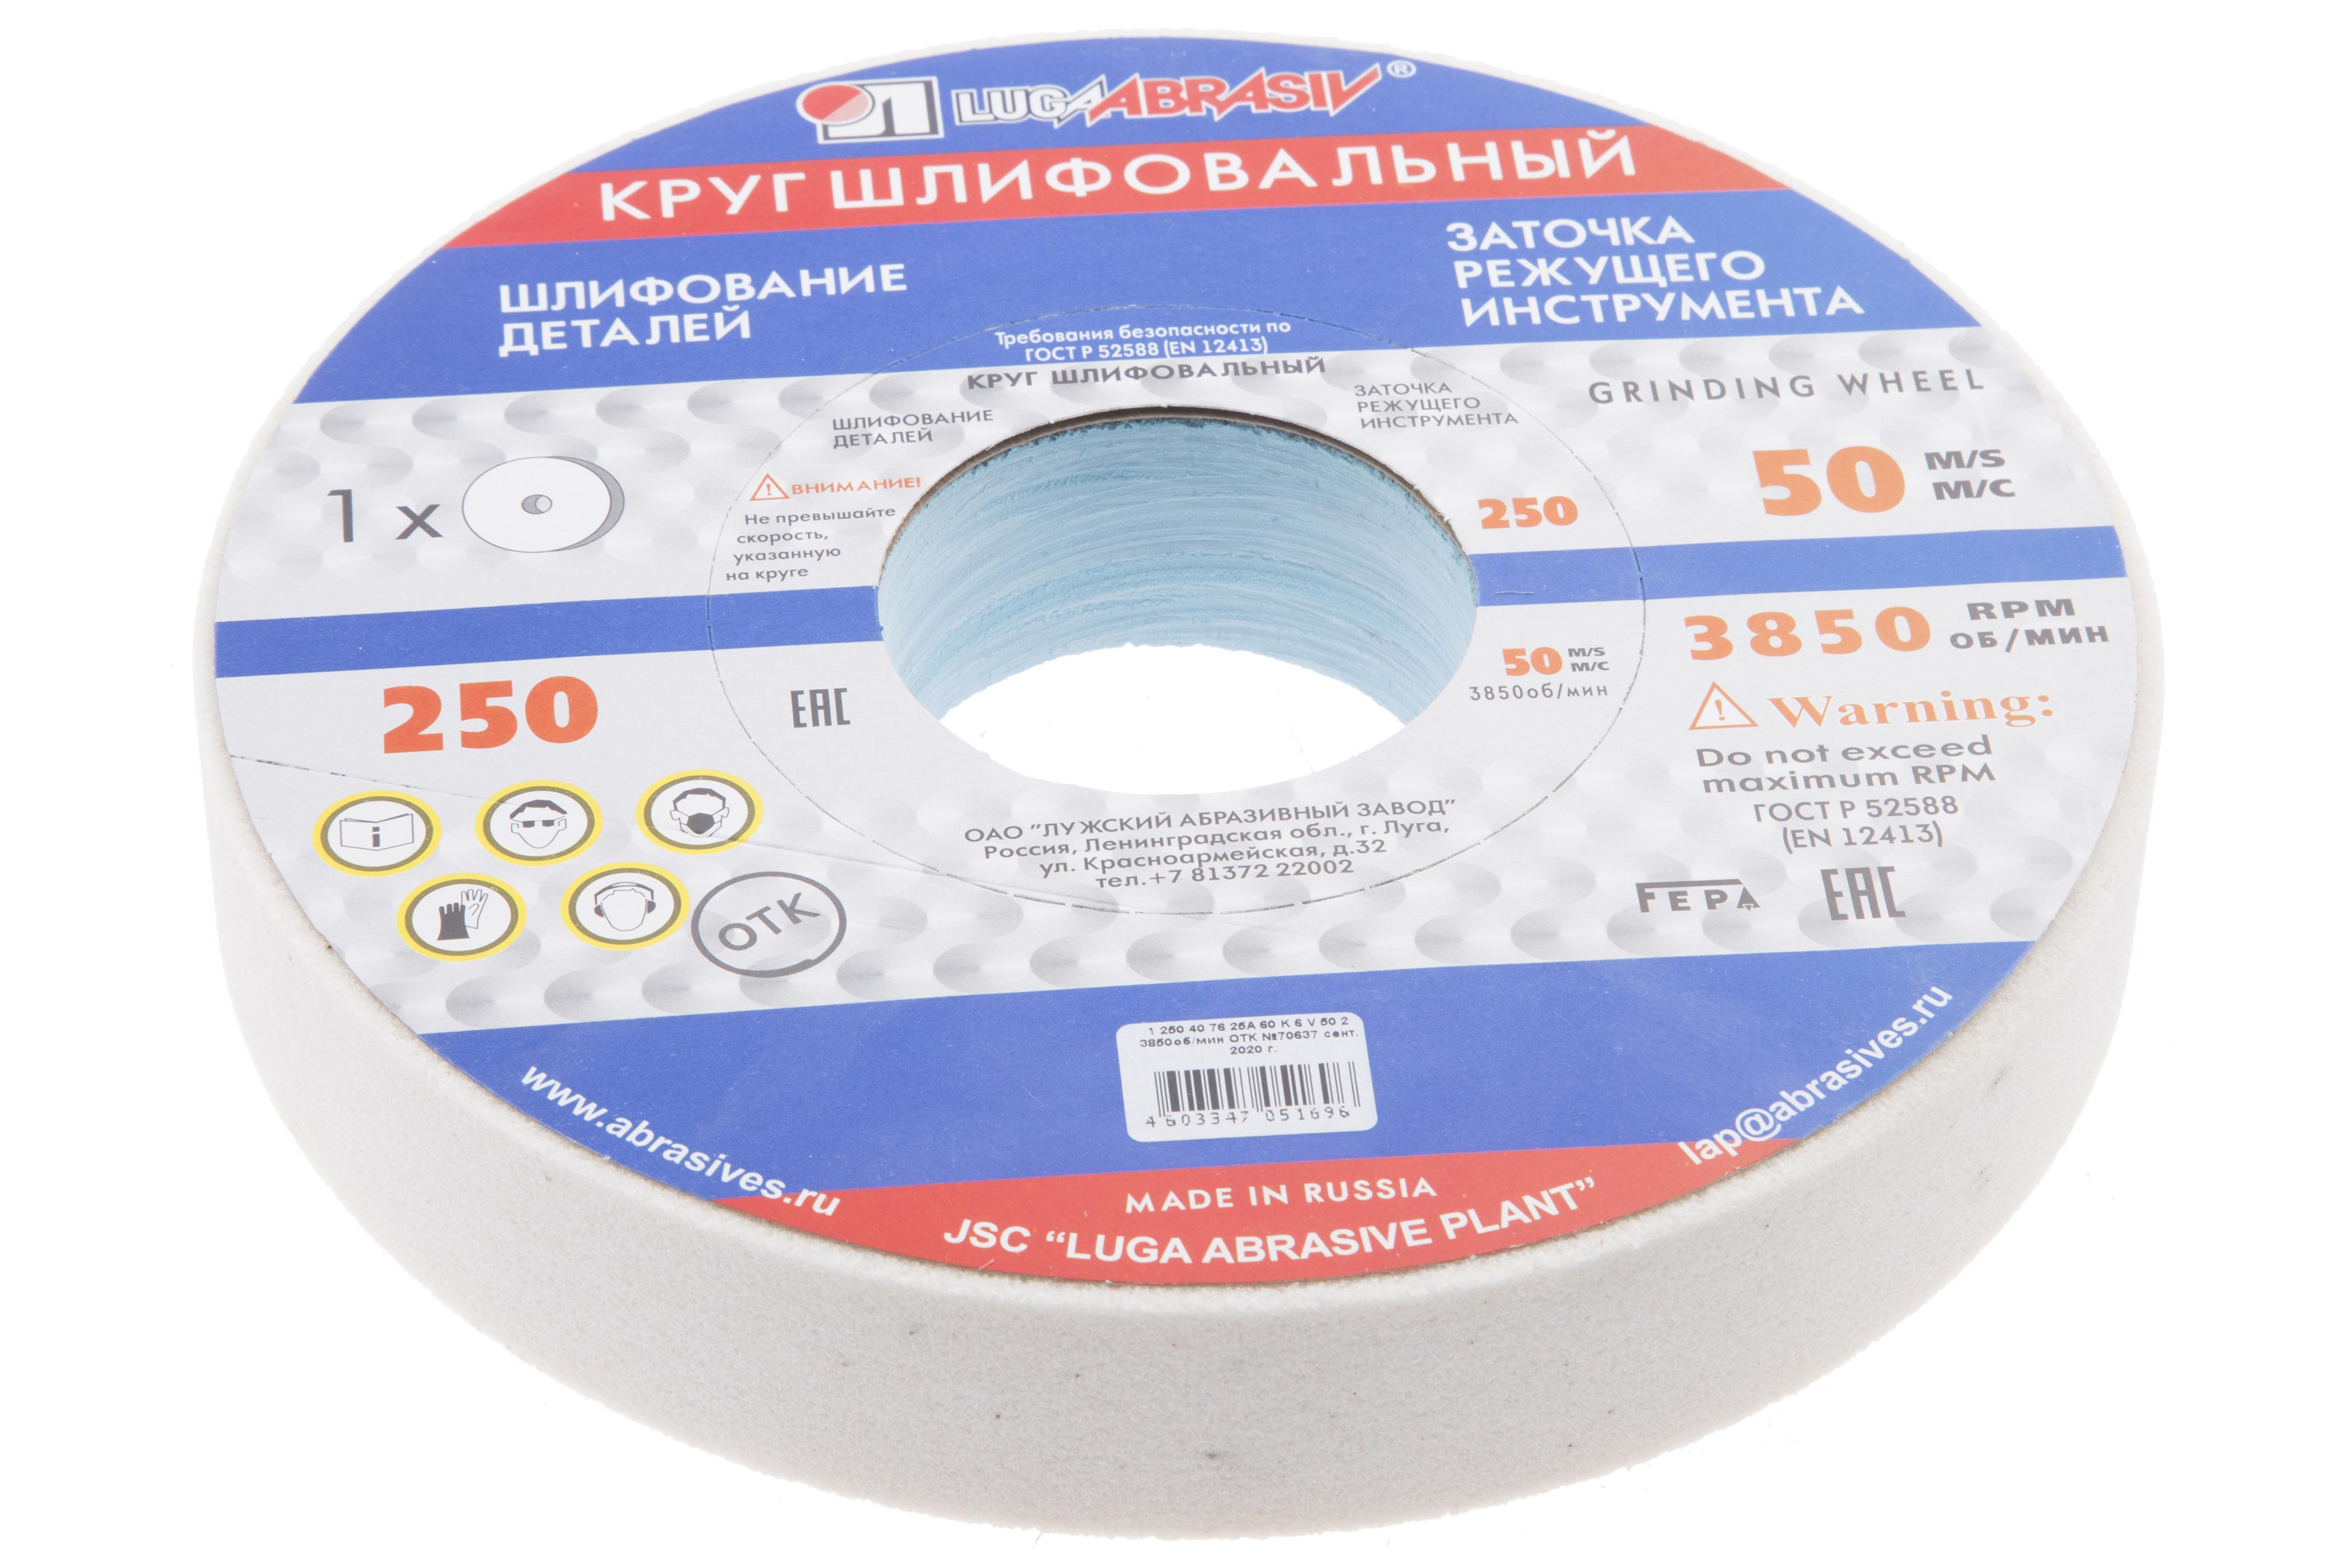 Круг шлифовальный ЛУГА-АБРАЗИВ 1 250 Х 40 Х 76 25А 60 k,l (25СМ) круг шлифовальный луга абразив 1 250 х 20 х 32 25а 40 k l